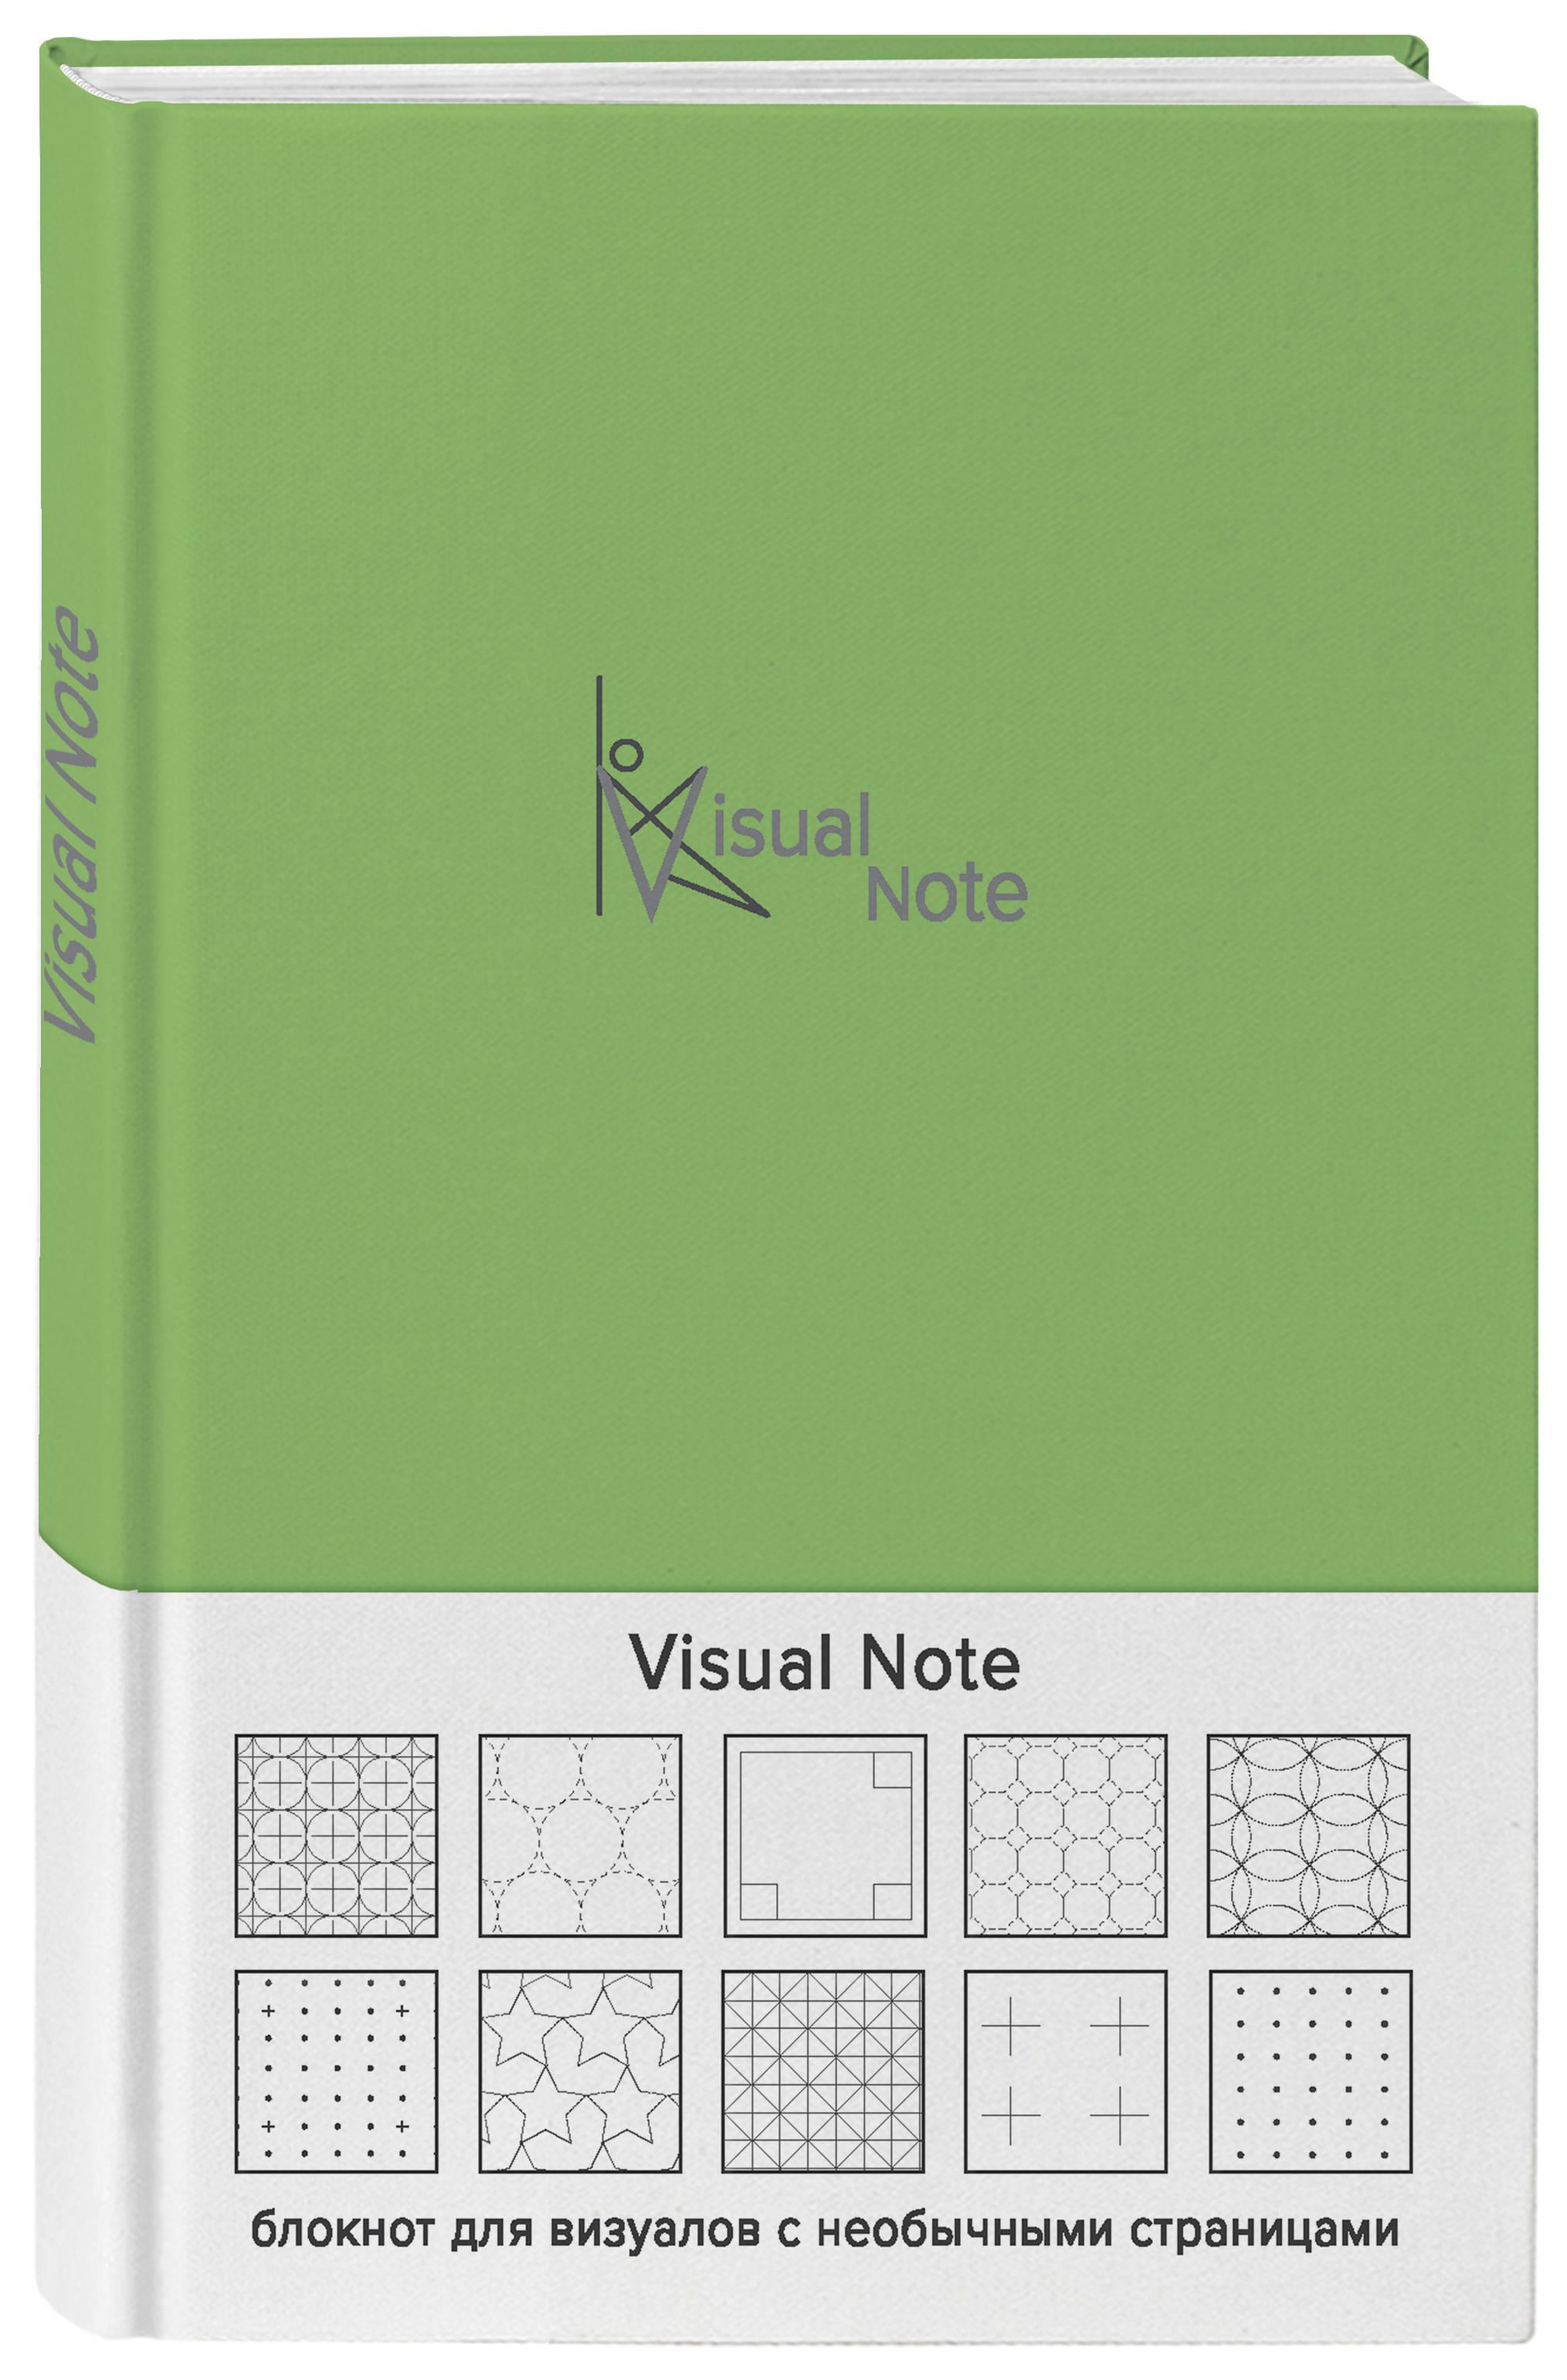 Visual note (оливковый) (Арте) mind ulness утренние страницы лимон